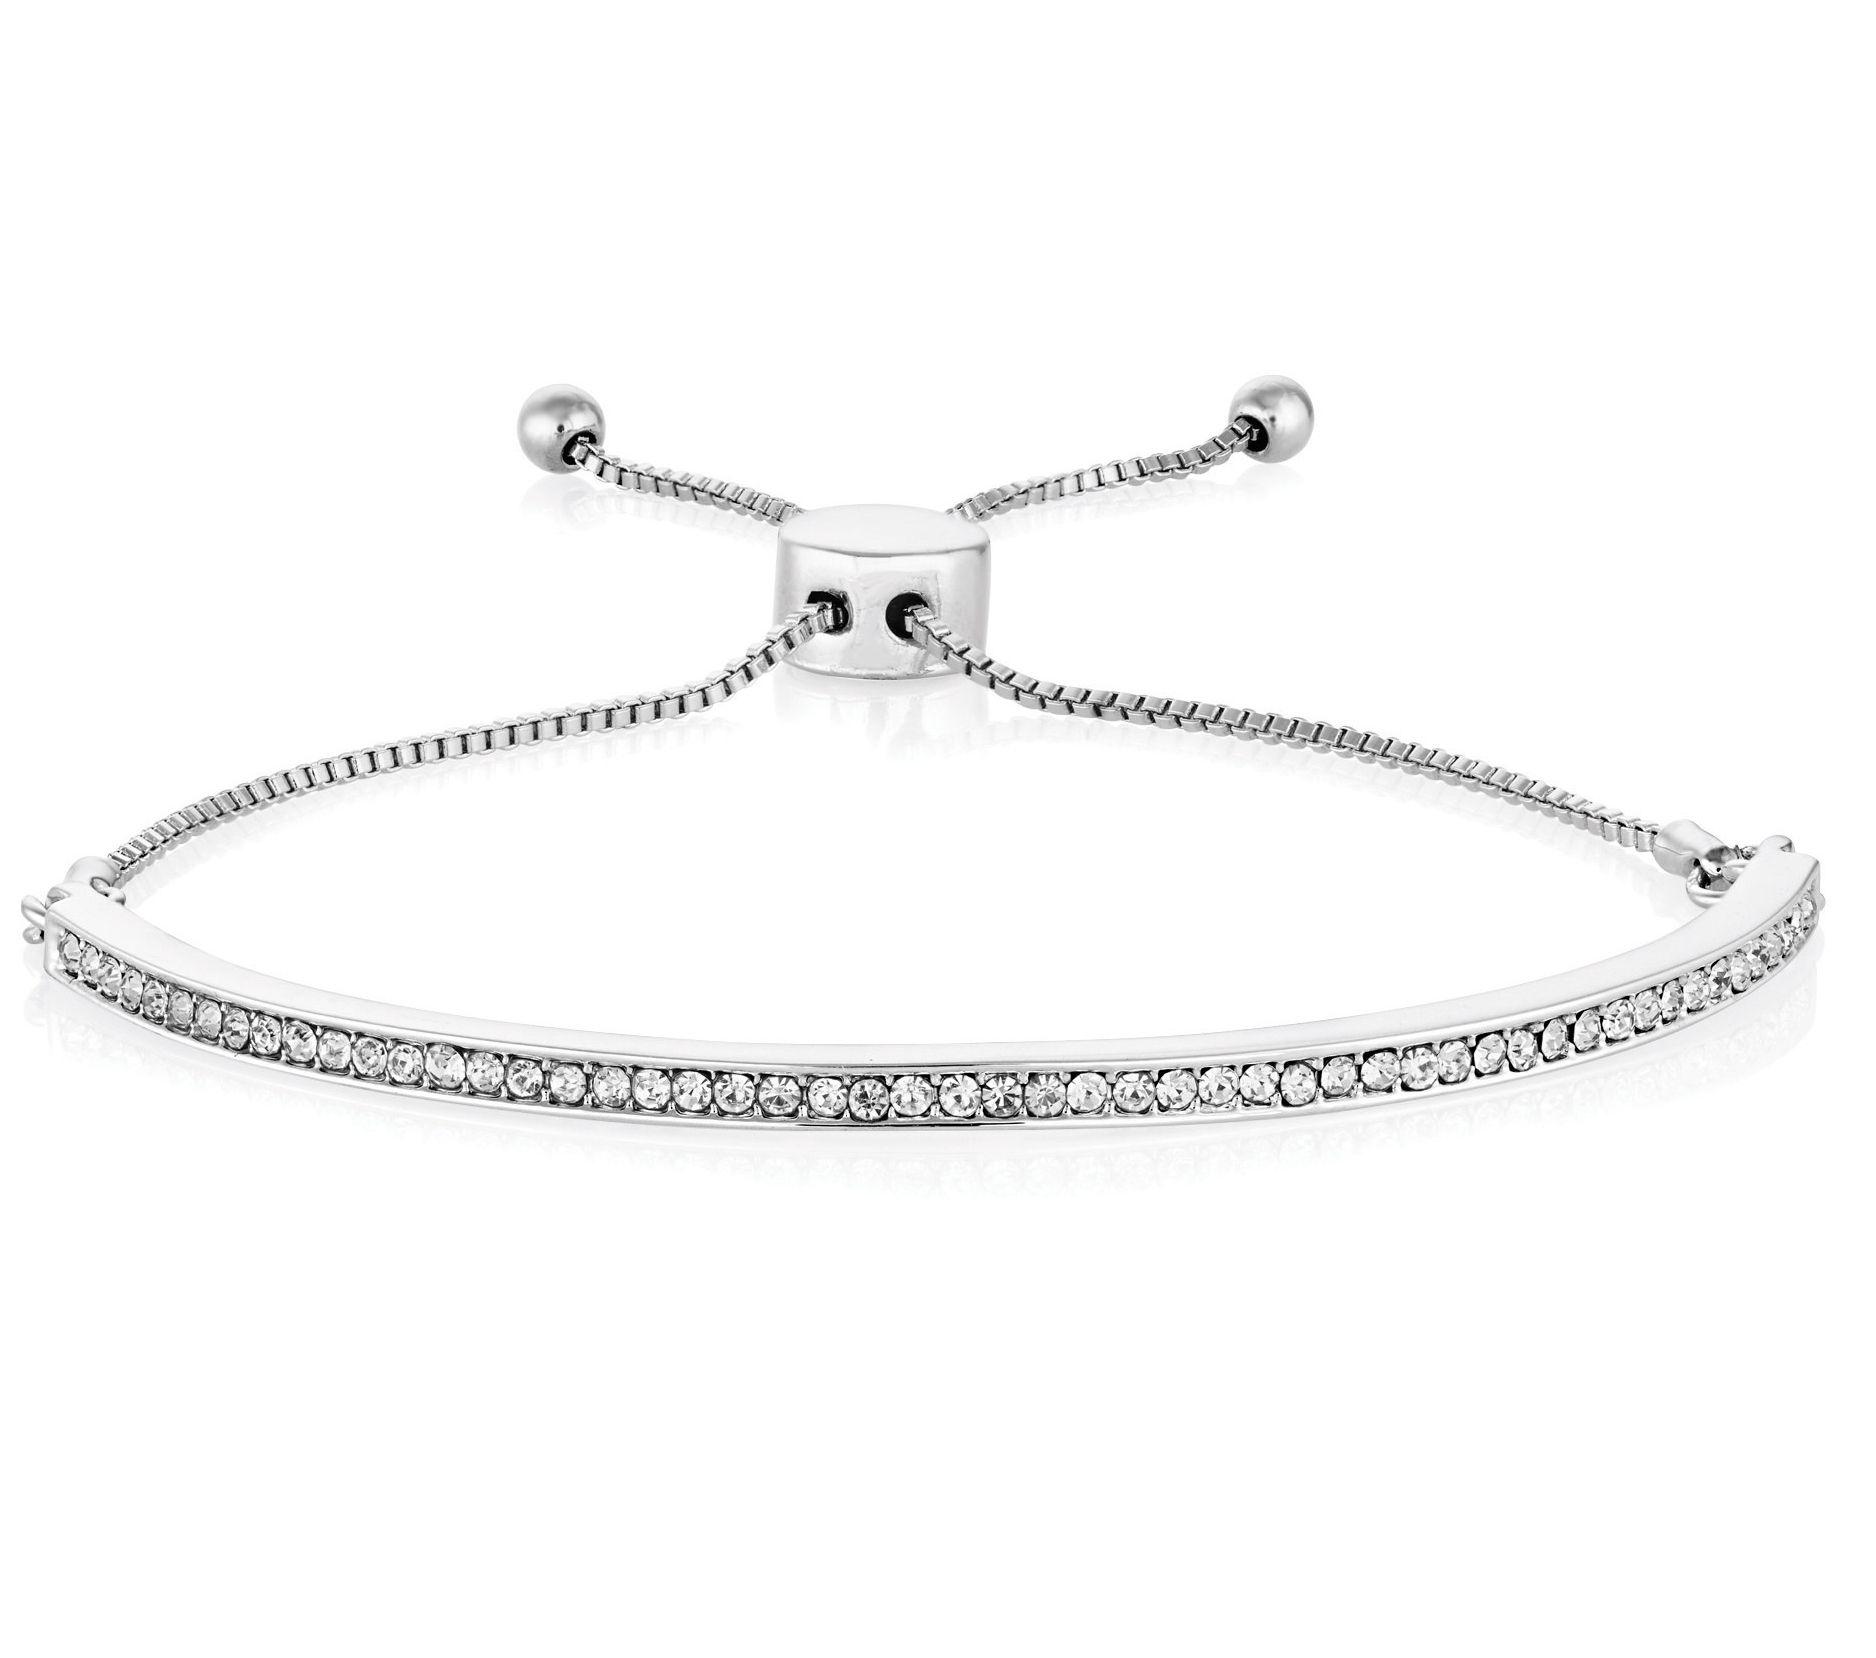 Buckley London Portobello Bracelet - Silver